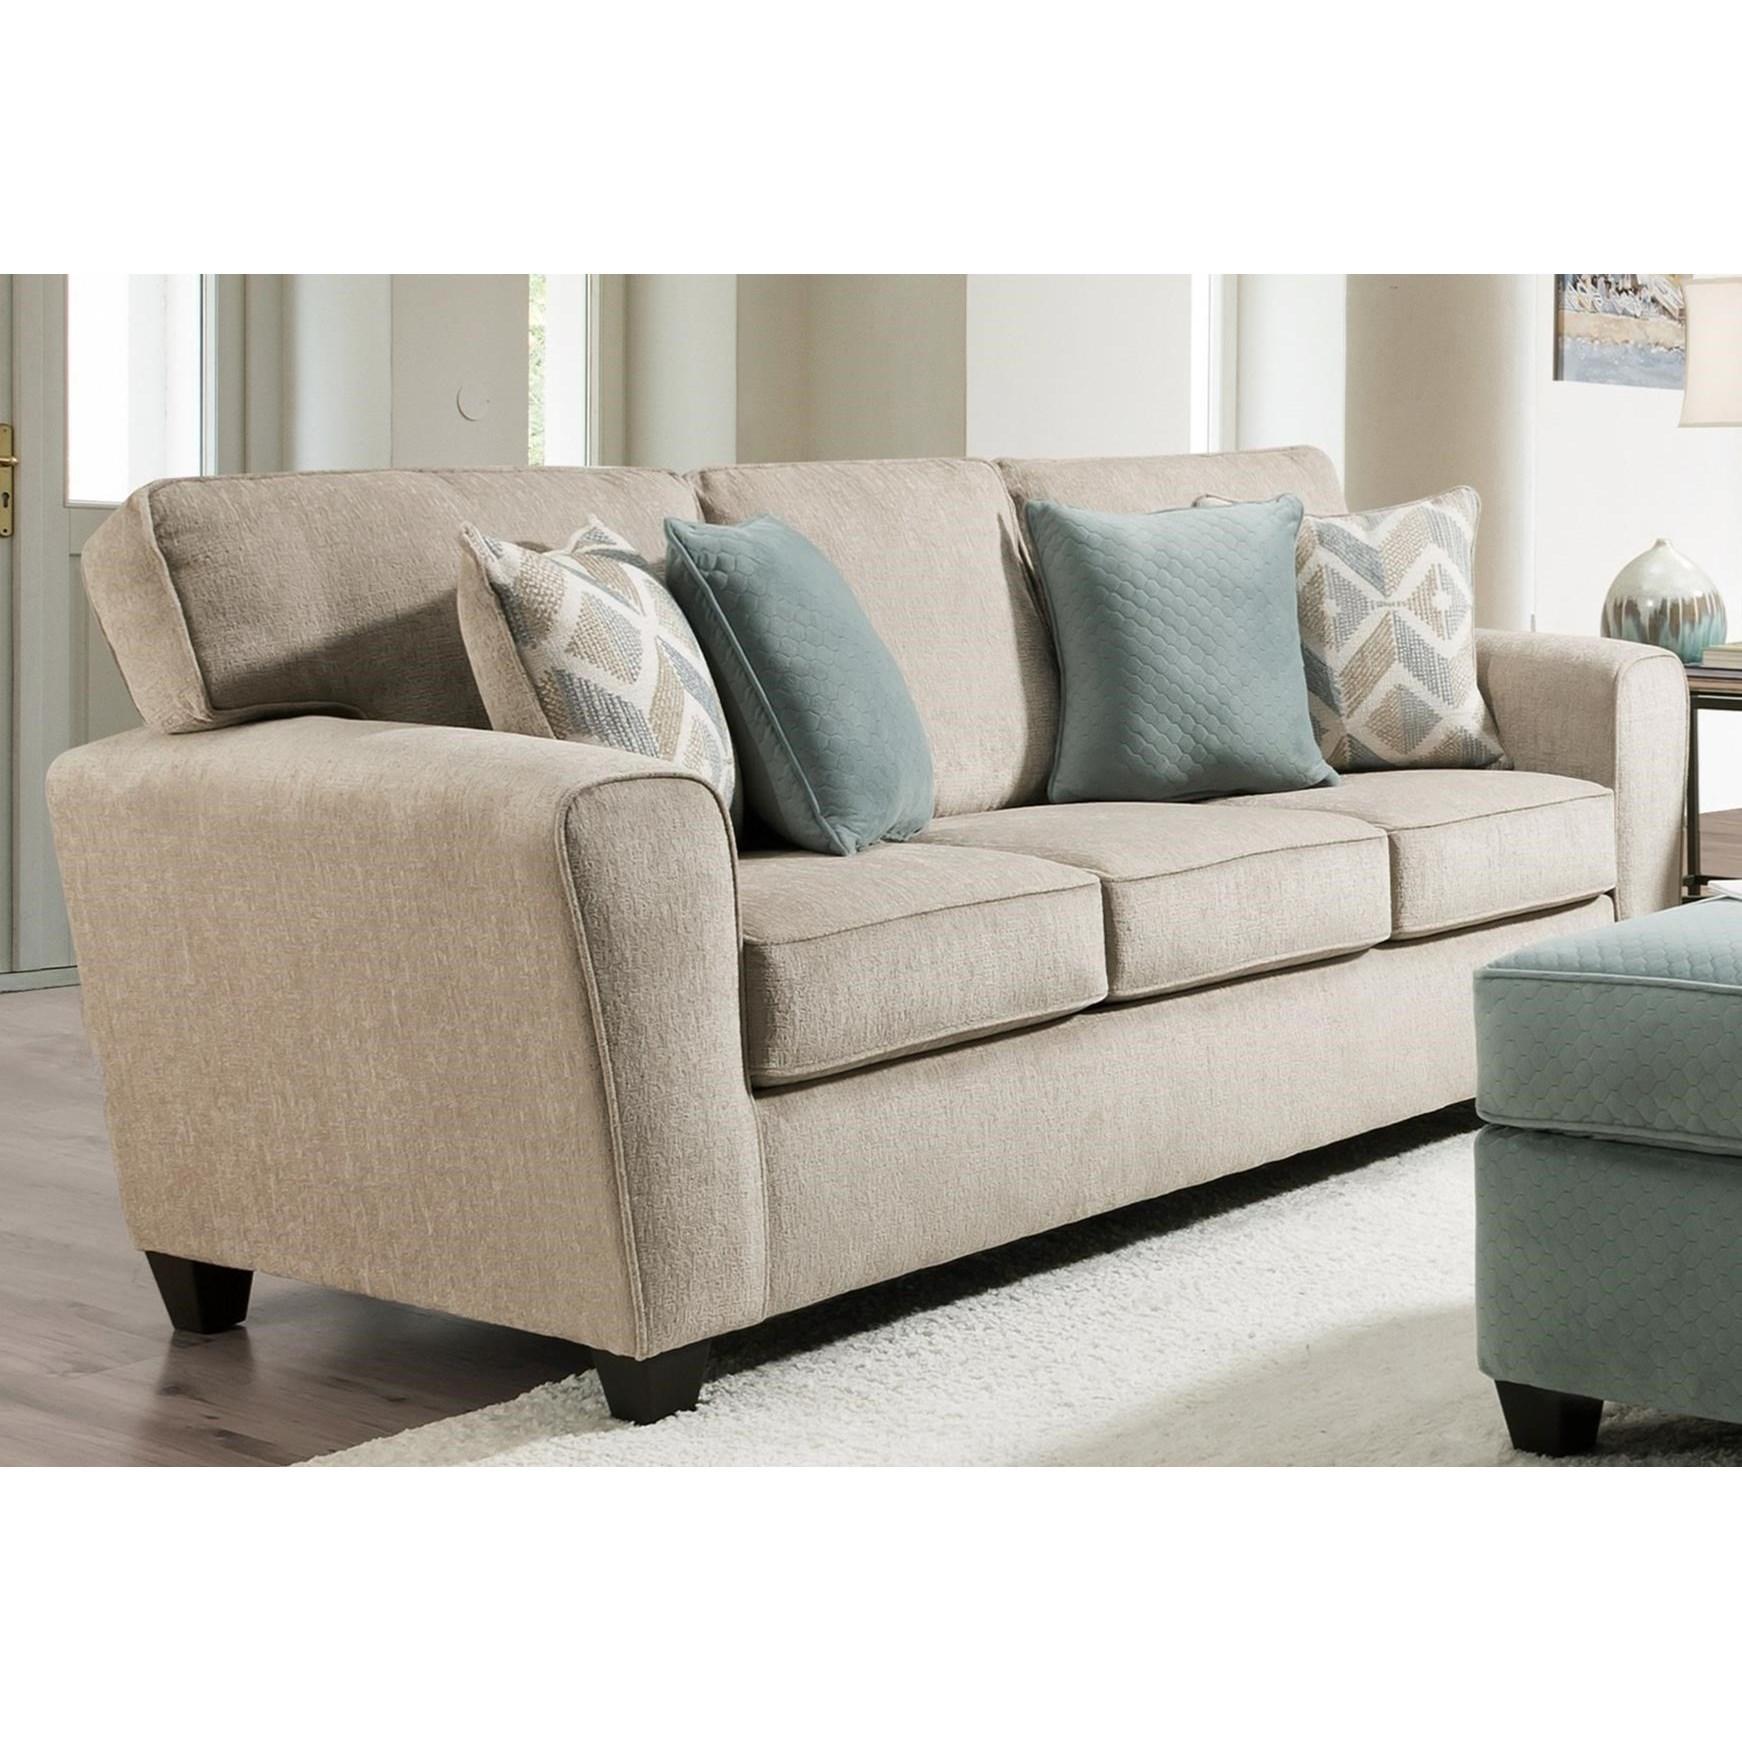 3100 Sofa  by Vendor 610 at Becker Furniture